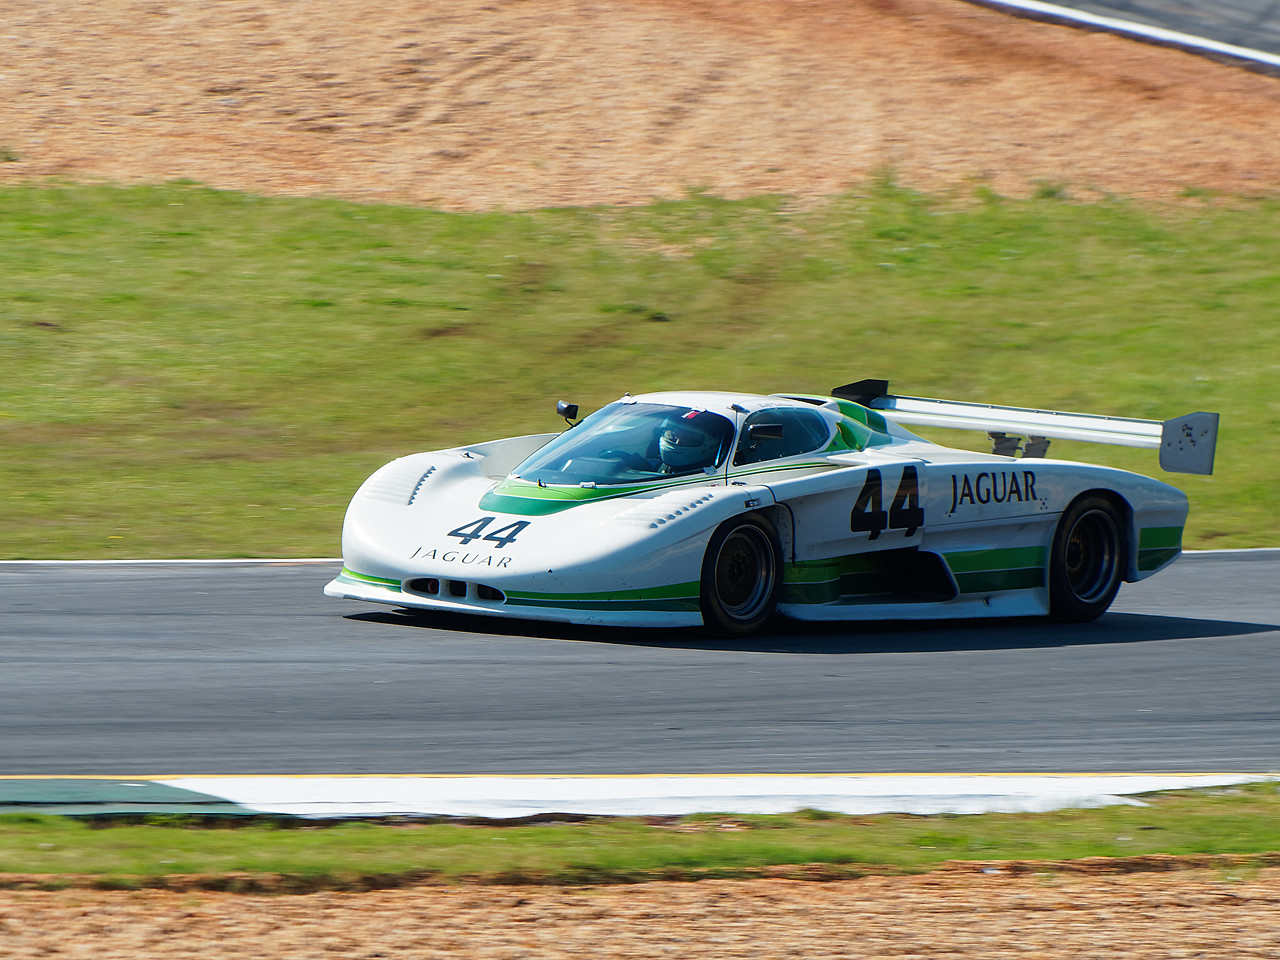 Beautifully sleek TWR Jaguar